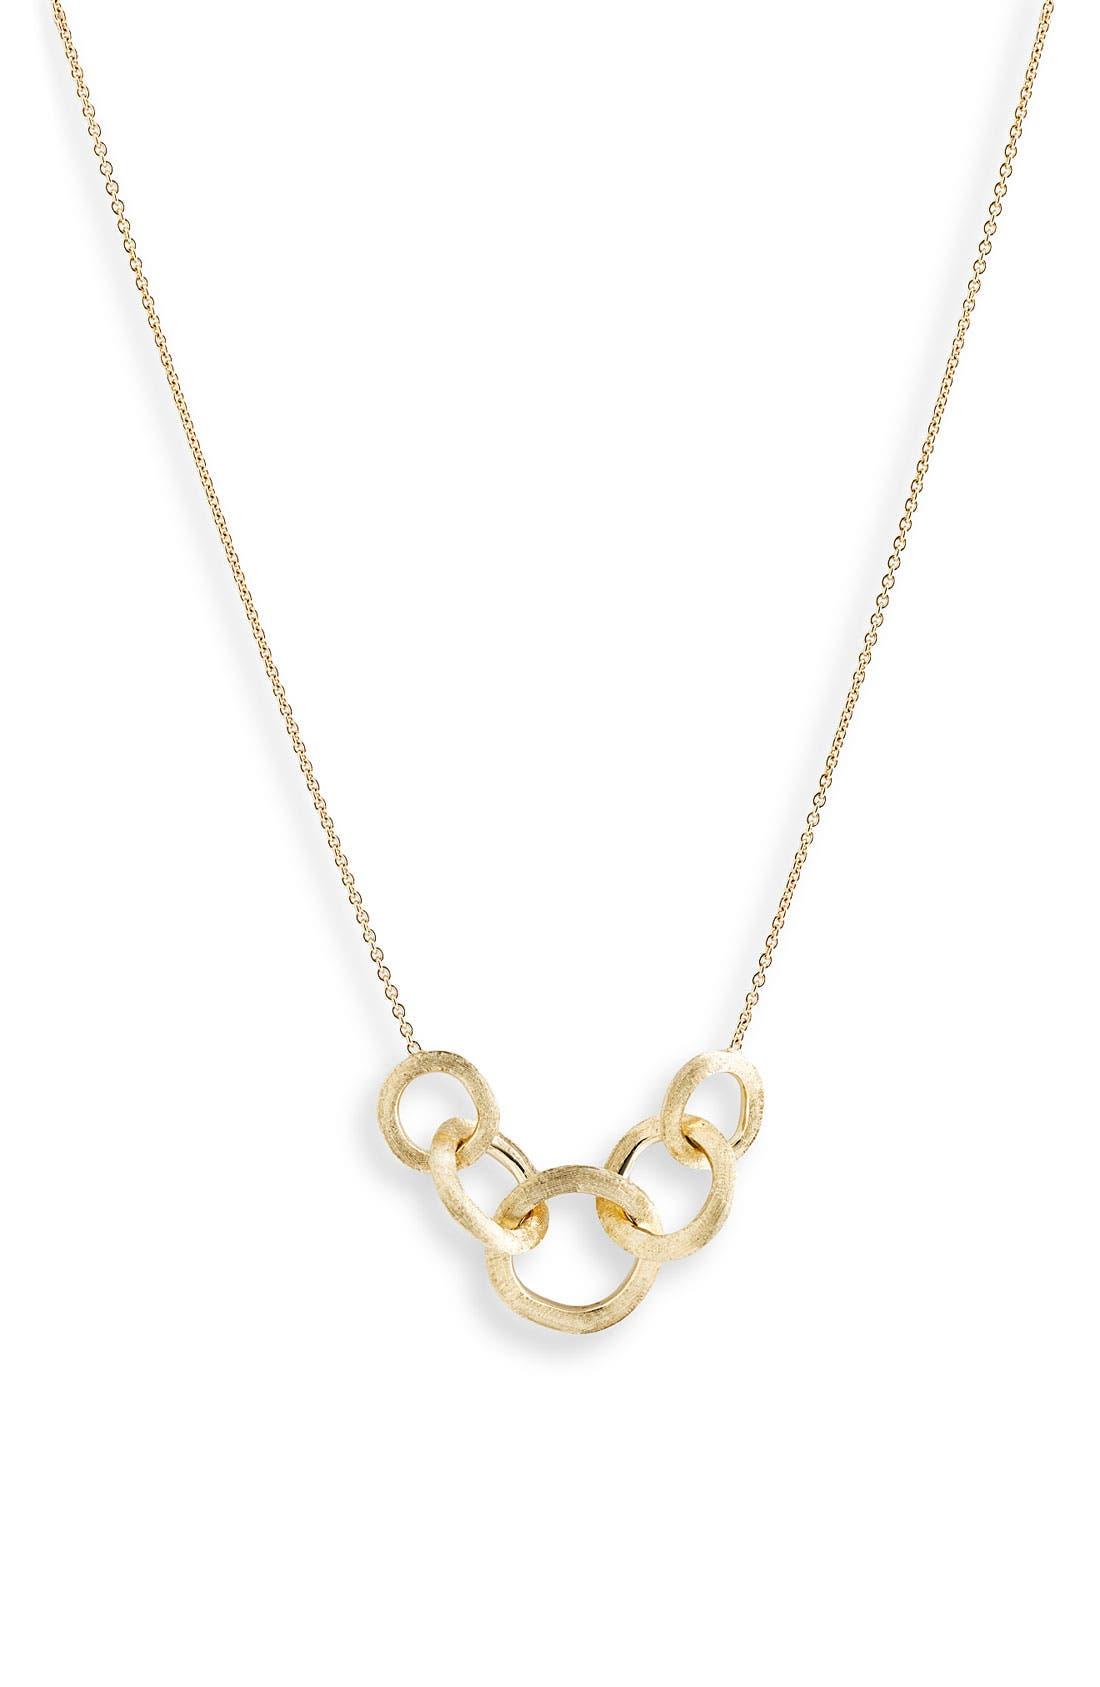 Main Image - Marco Bicego 'Jaipur' Link Necklace